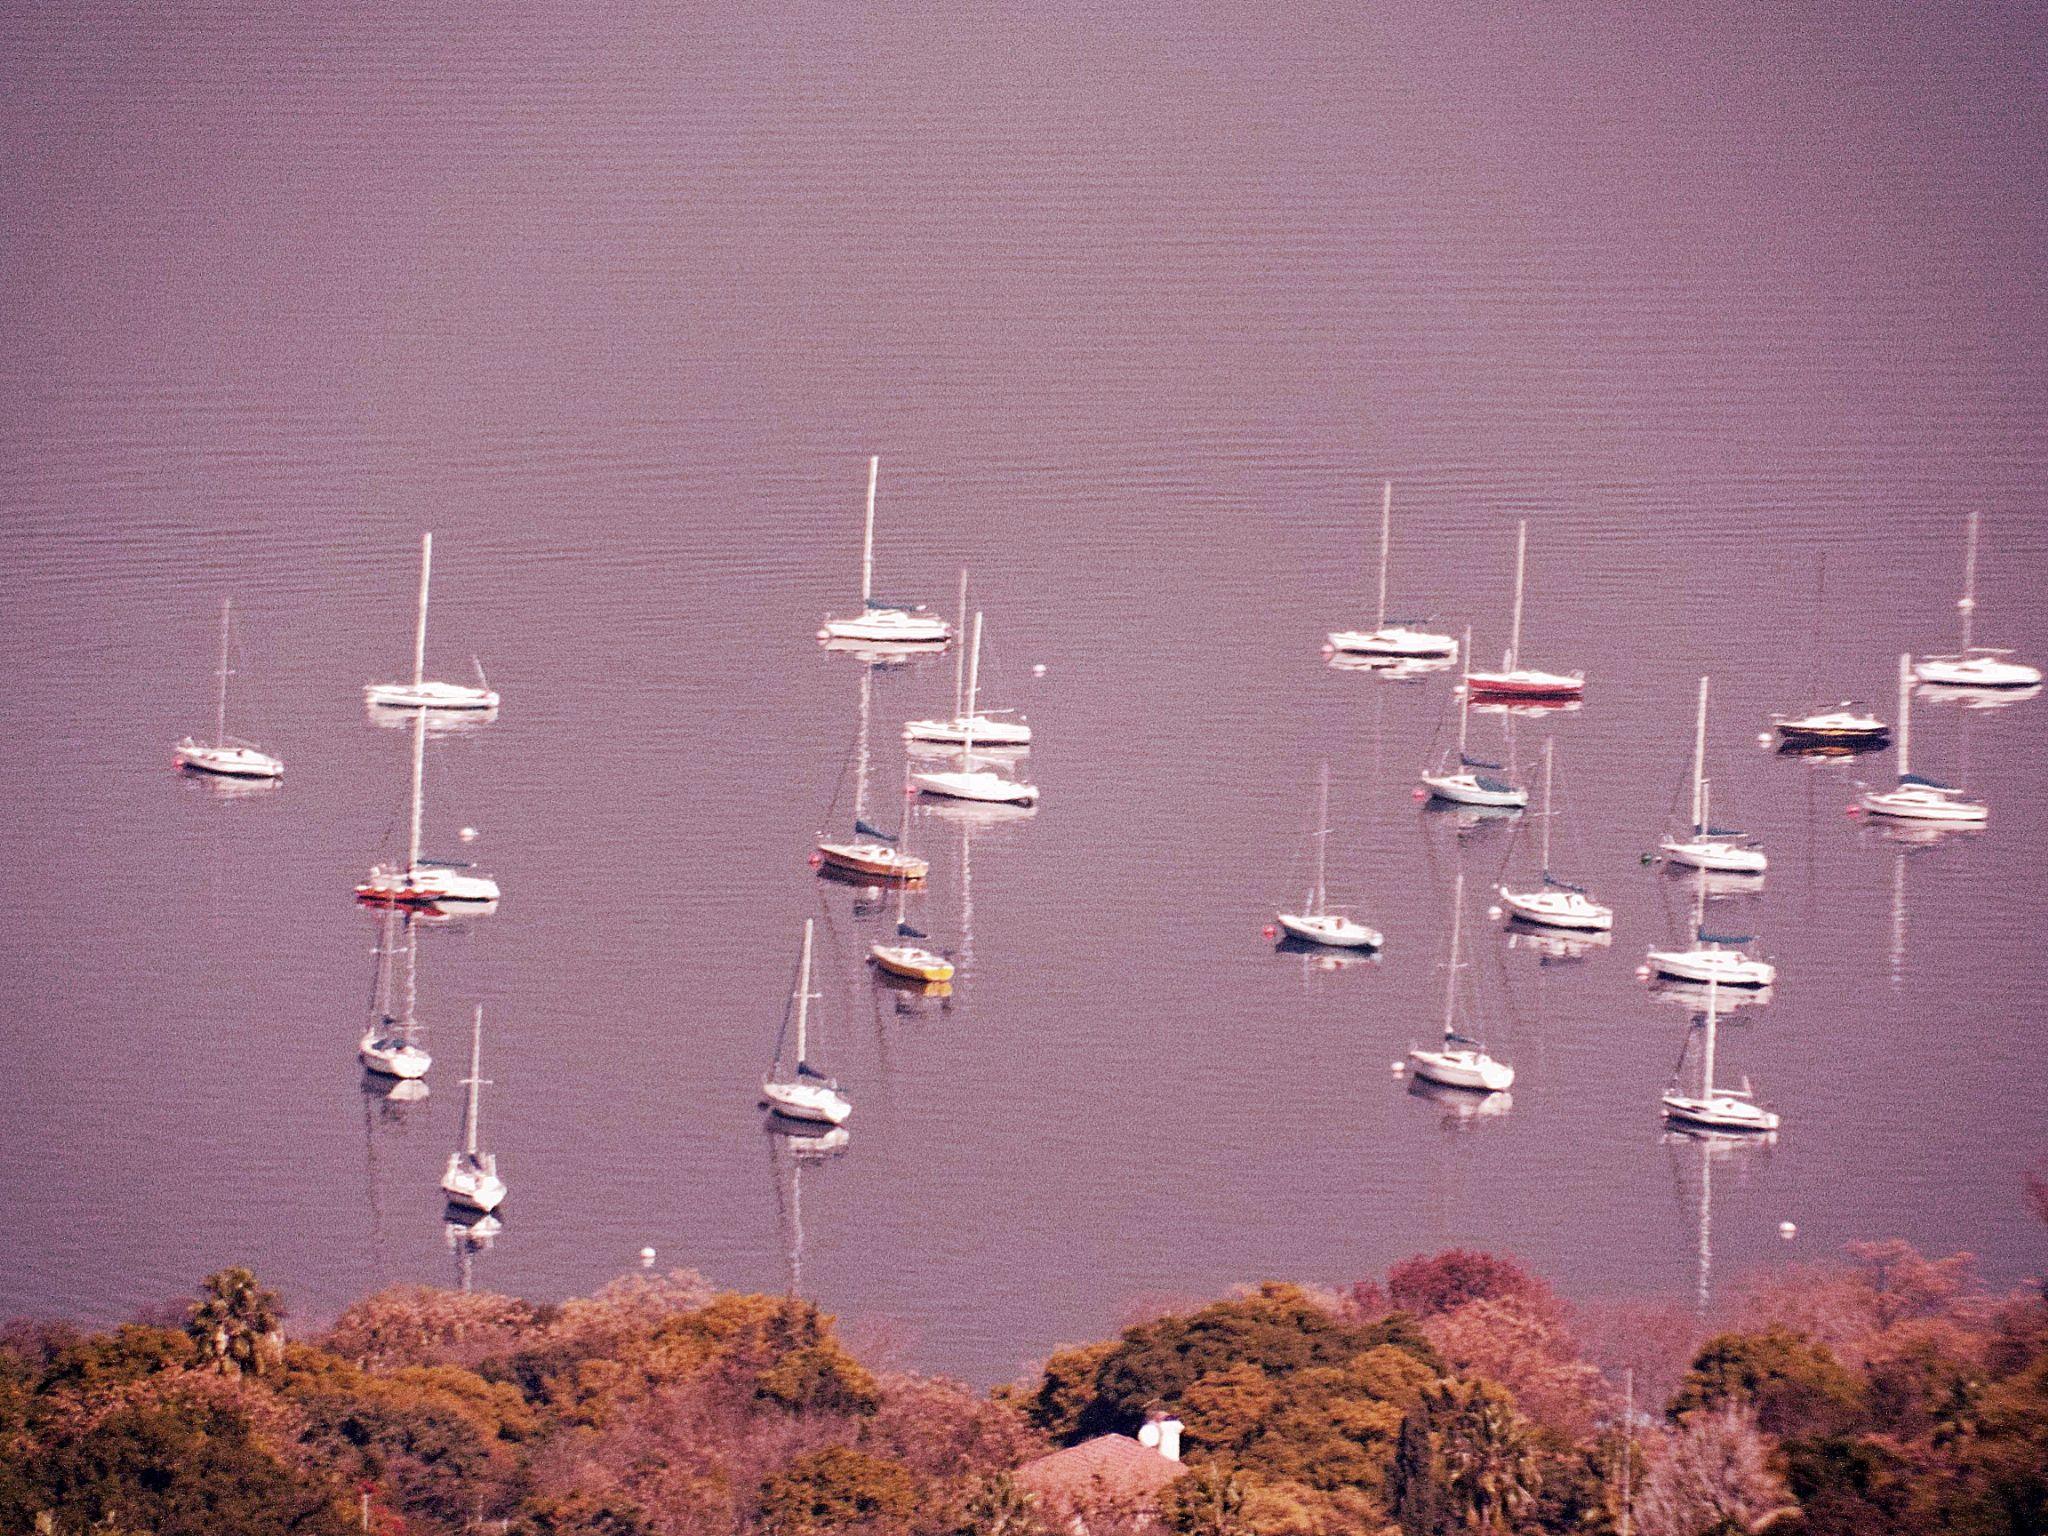 Boat by wynand.roelofse